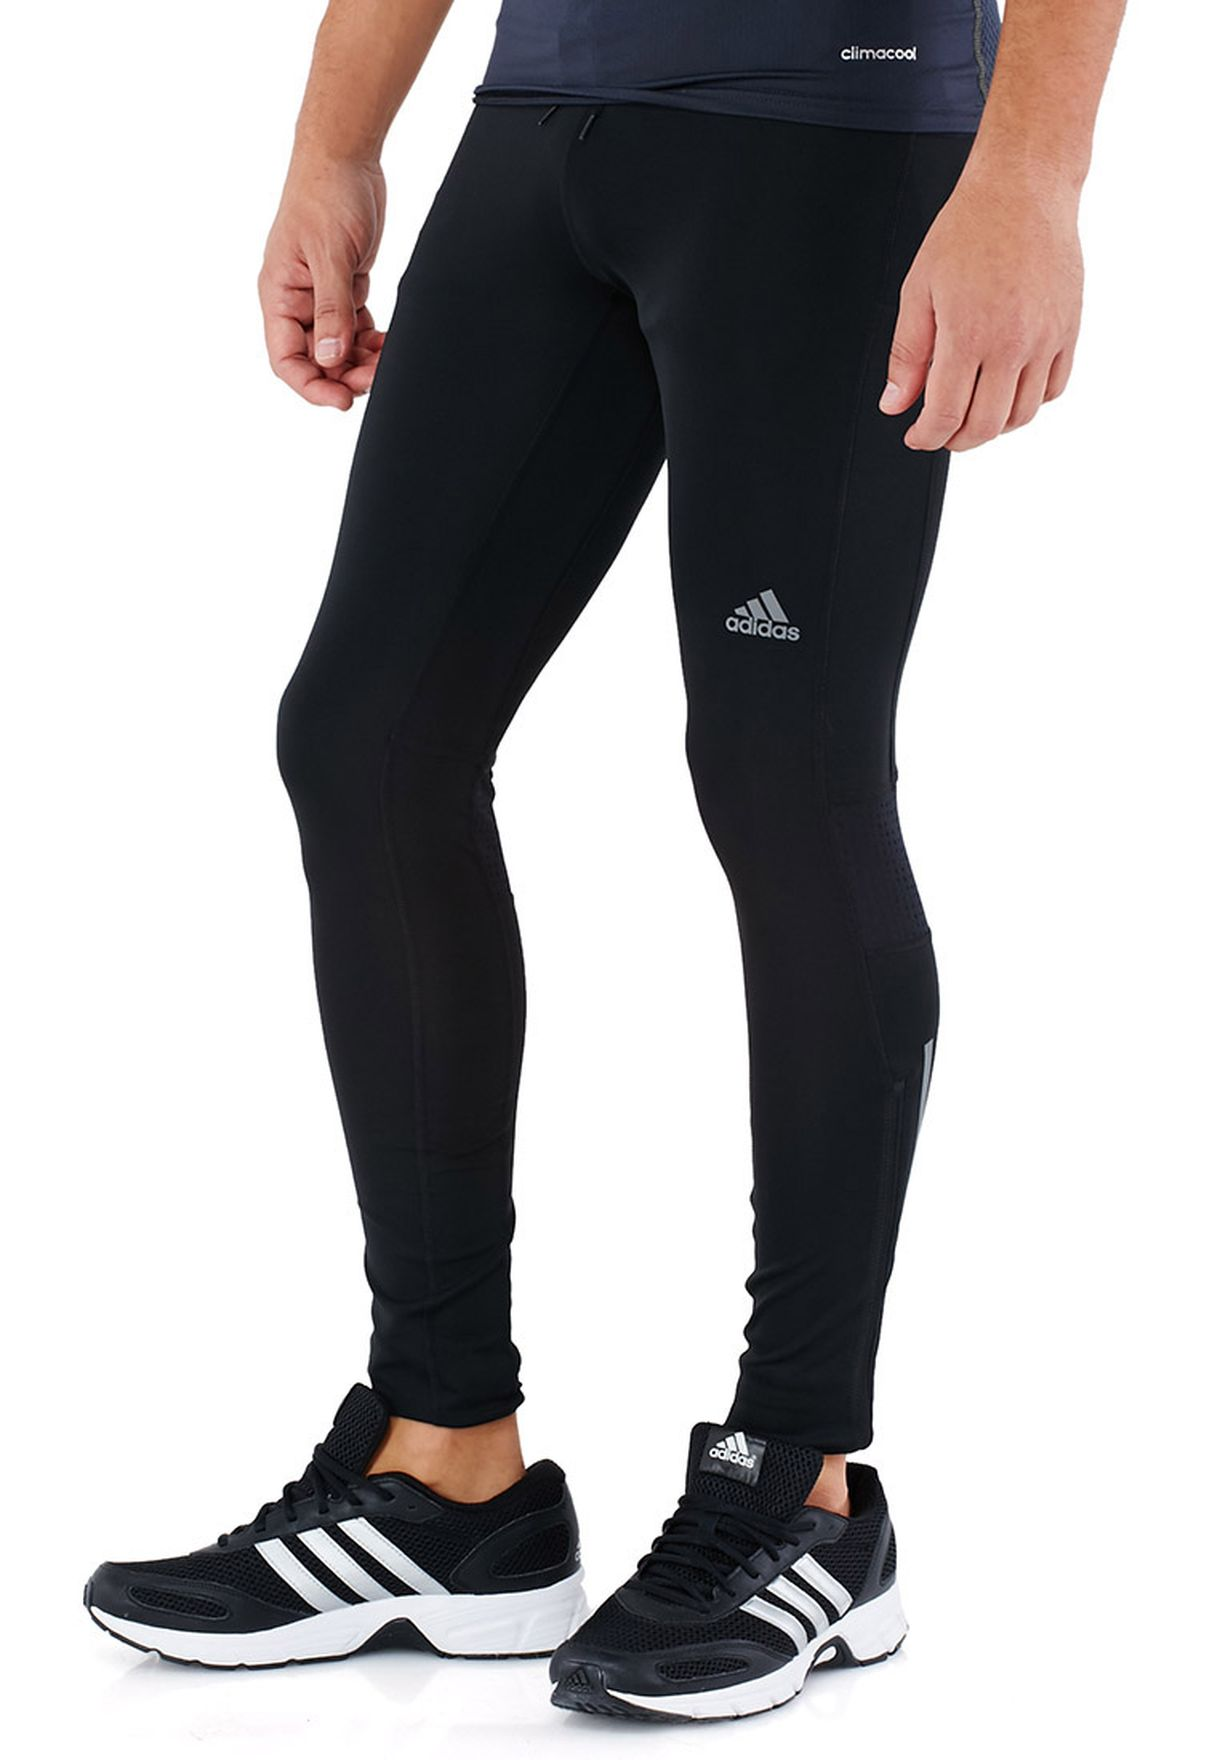 e2fec616fa716 Shop adidas black Supernova Tights G89623 for Men in UAE - AD476AT90FJP